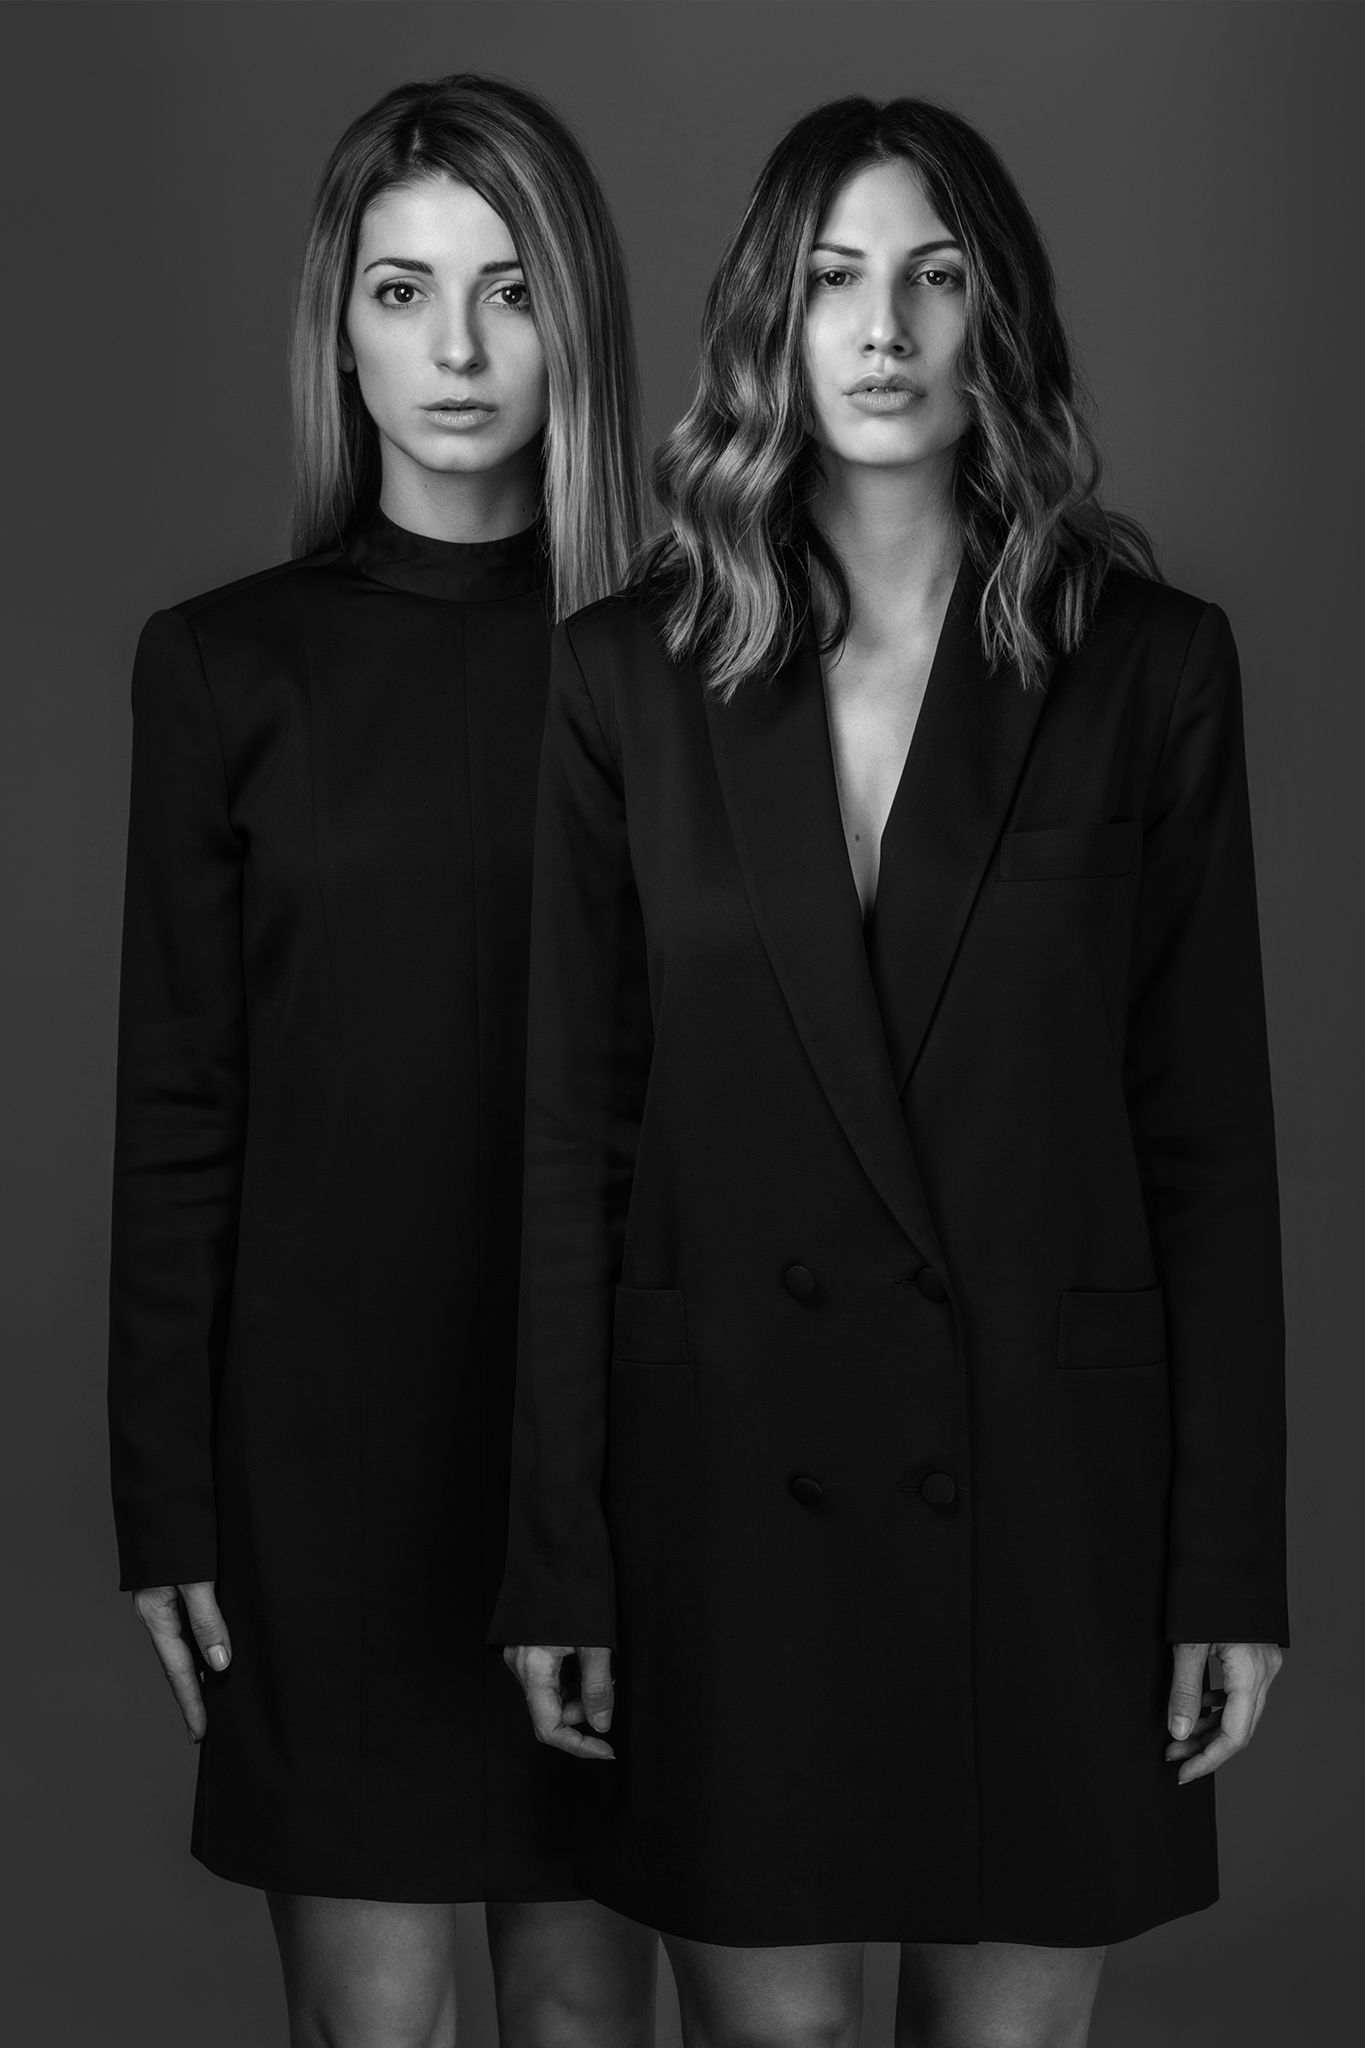 Interview with croatian fashion designers mateyaneira fashion